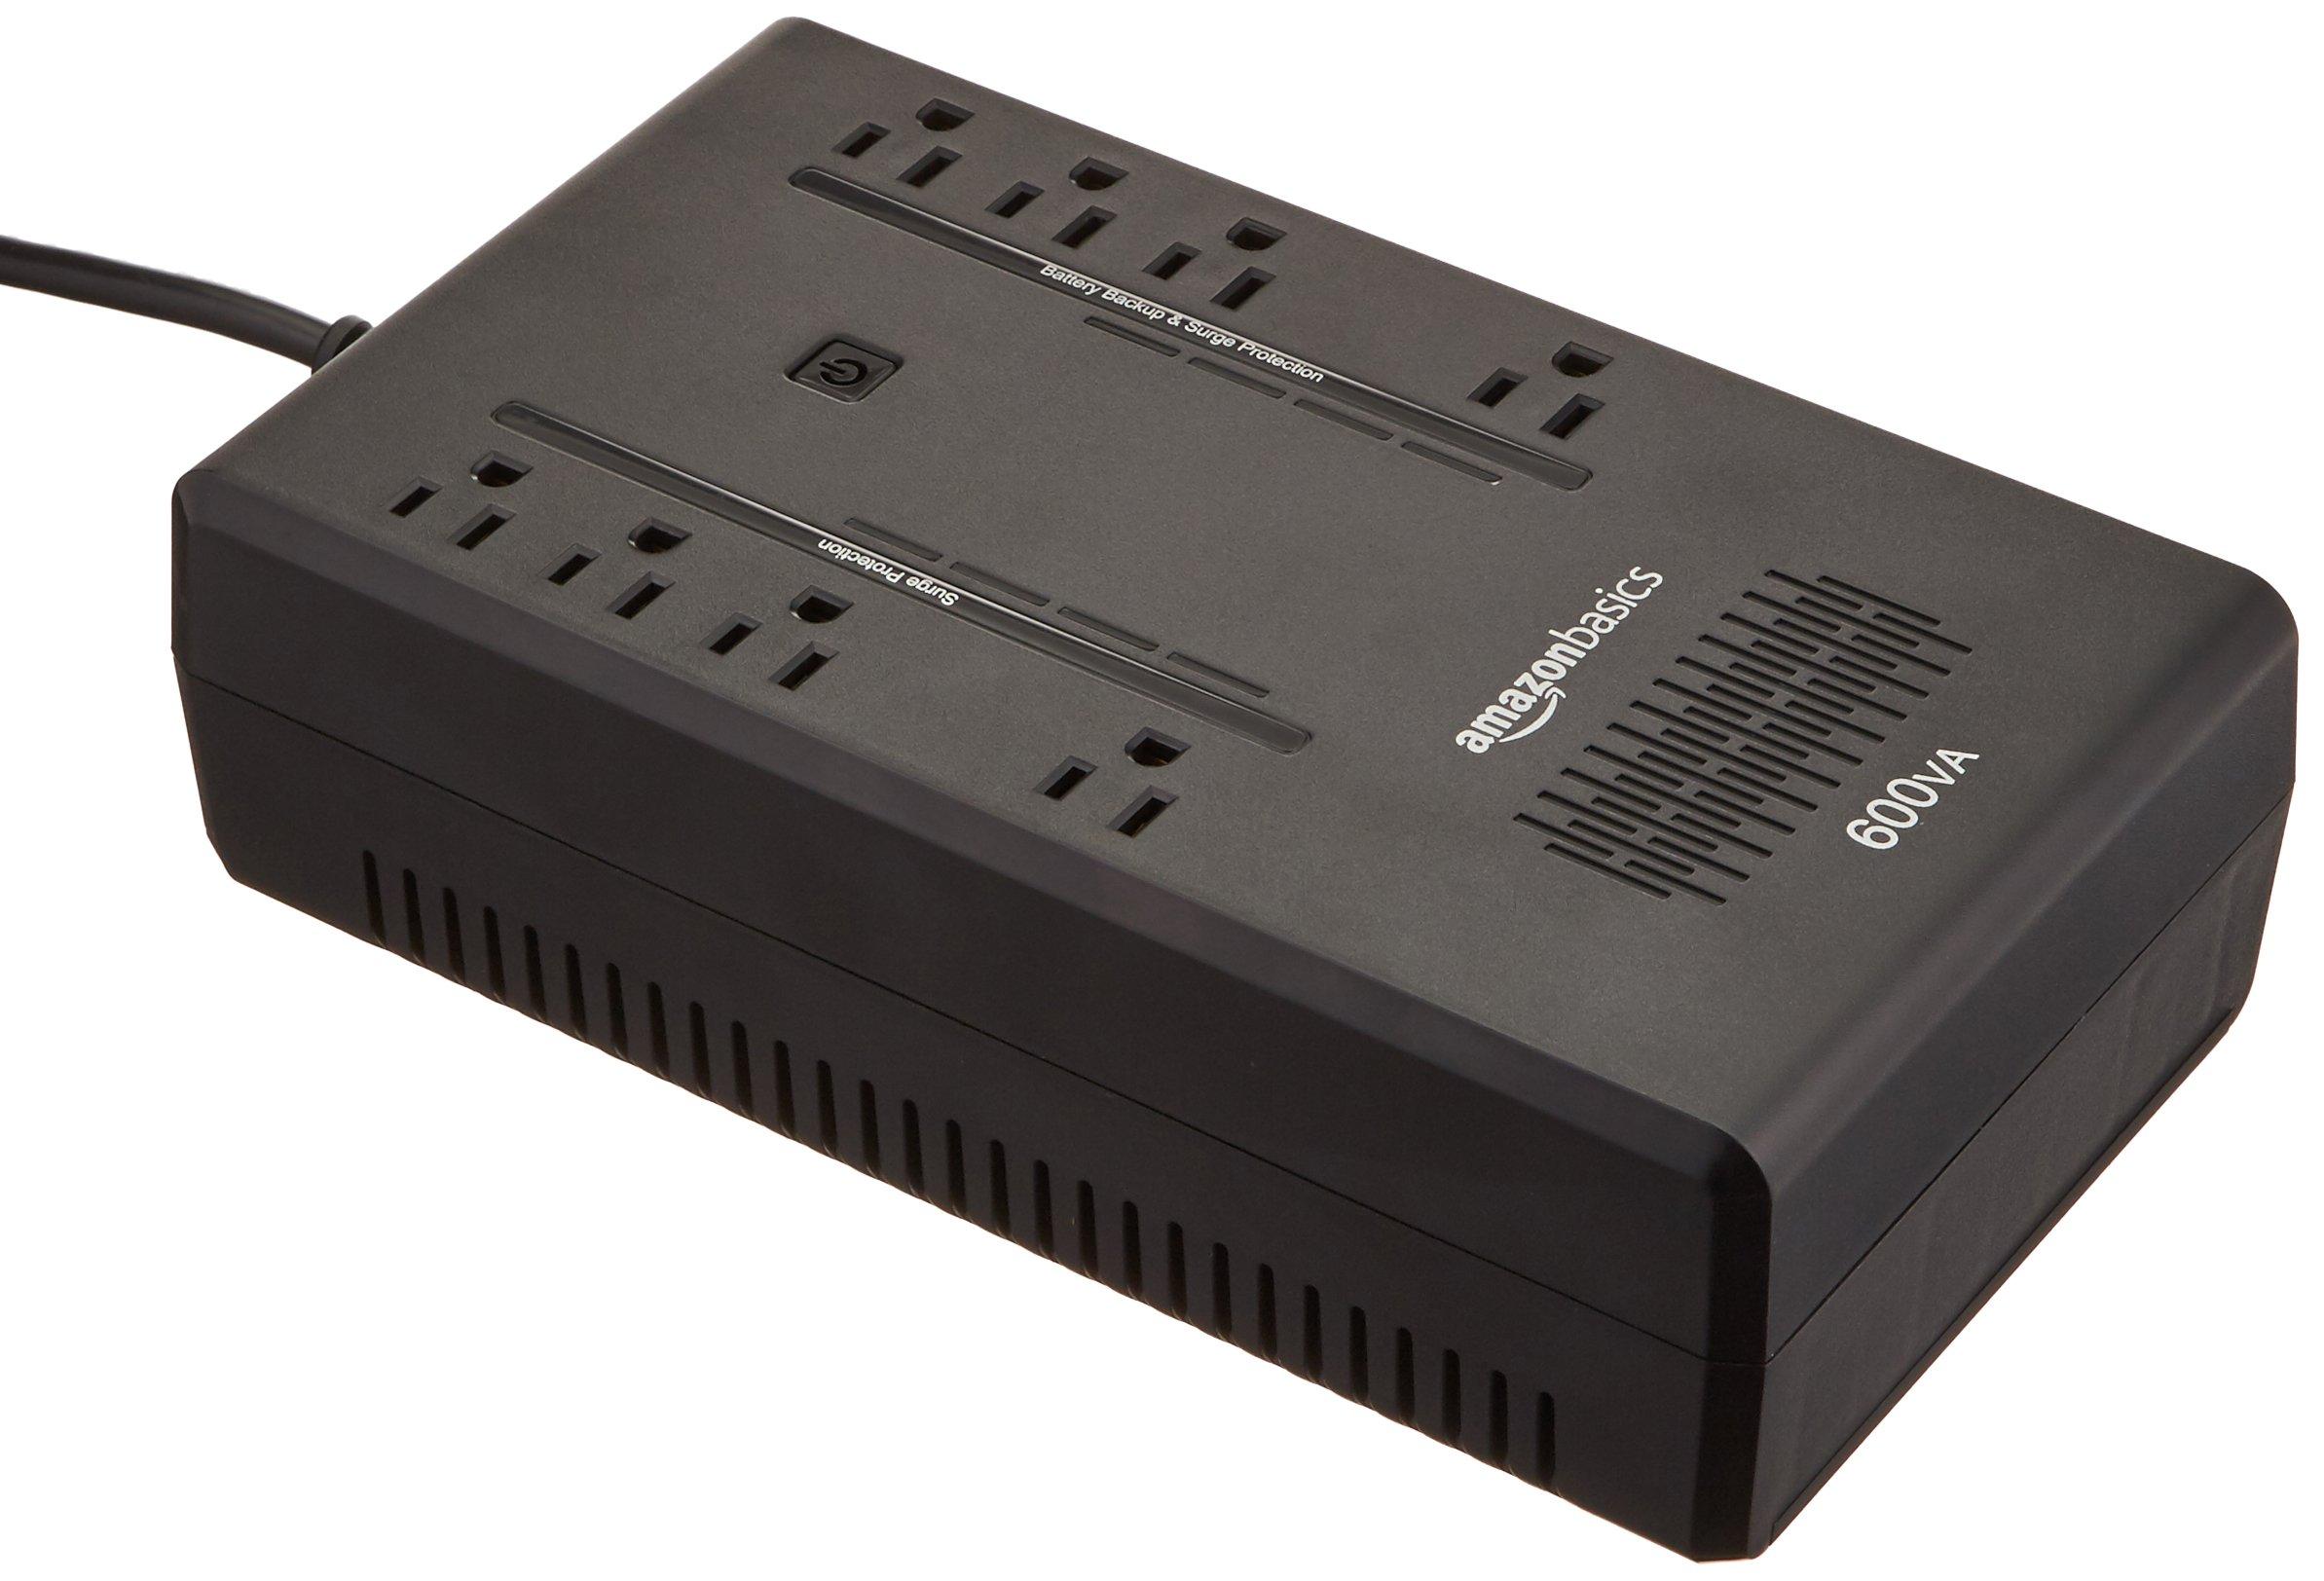 AmazonBasics Standby UPS 600VA 360W Surge Protector Battery Backup, 8 Outlets